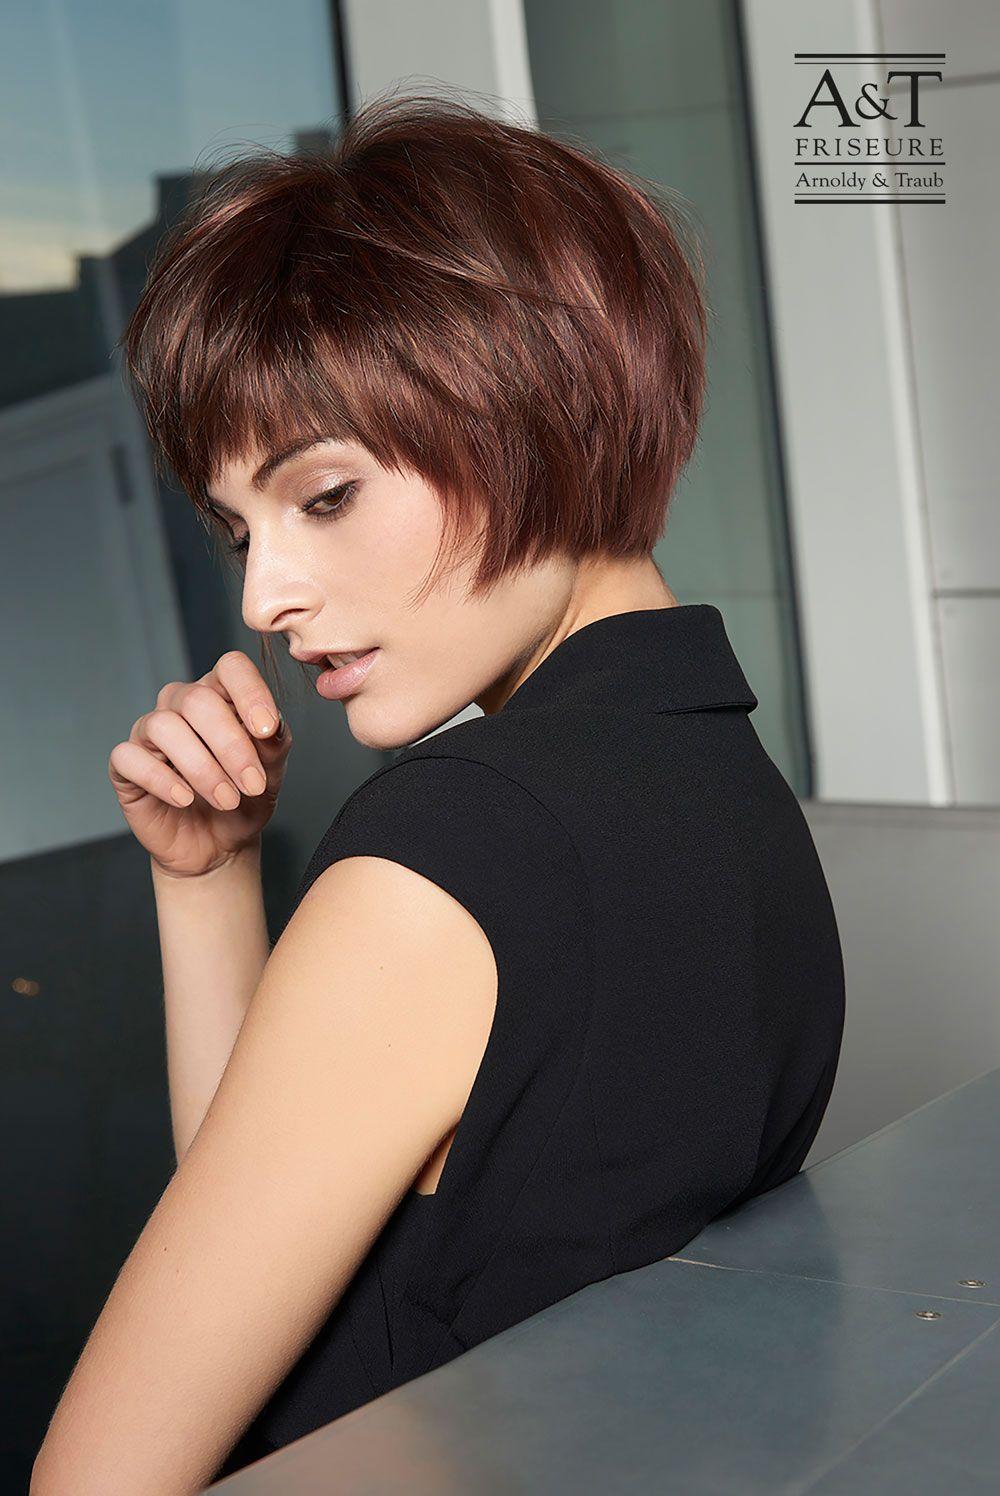 Frisuren Kurz Gestuft Frech 2021 Haarschnitt Damen Kurze Haare Frauen Bob Haarschnitt